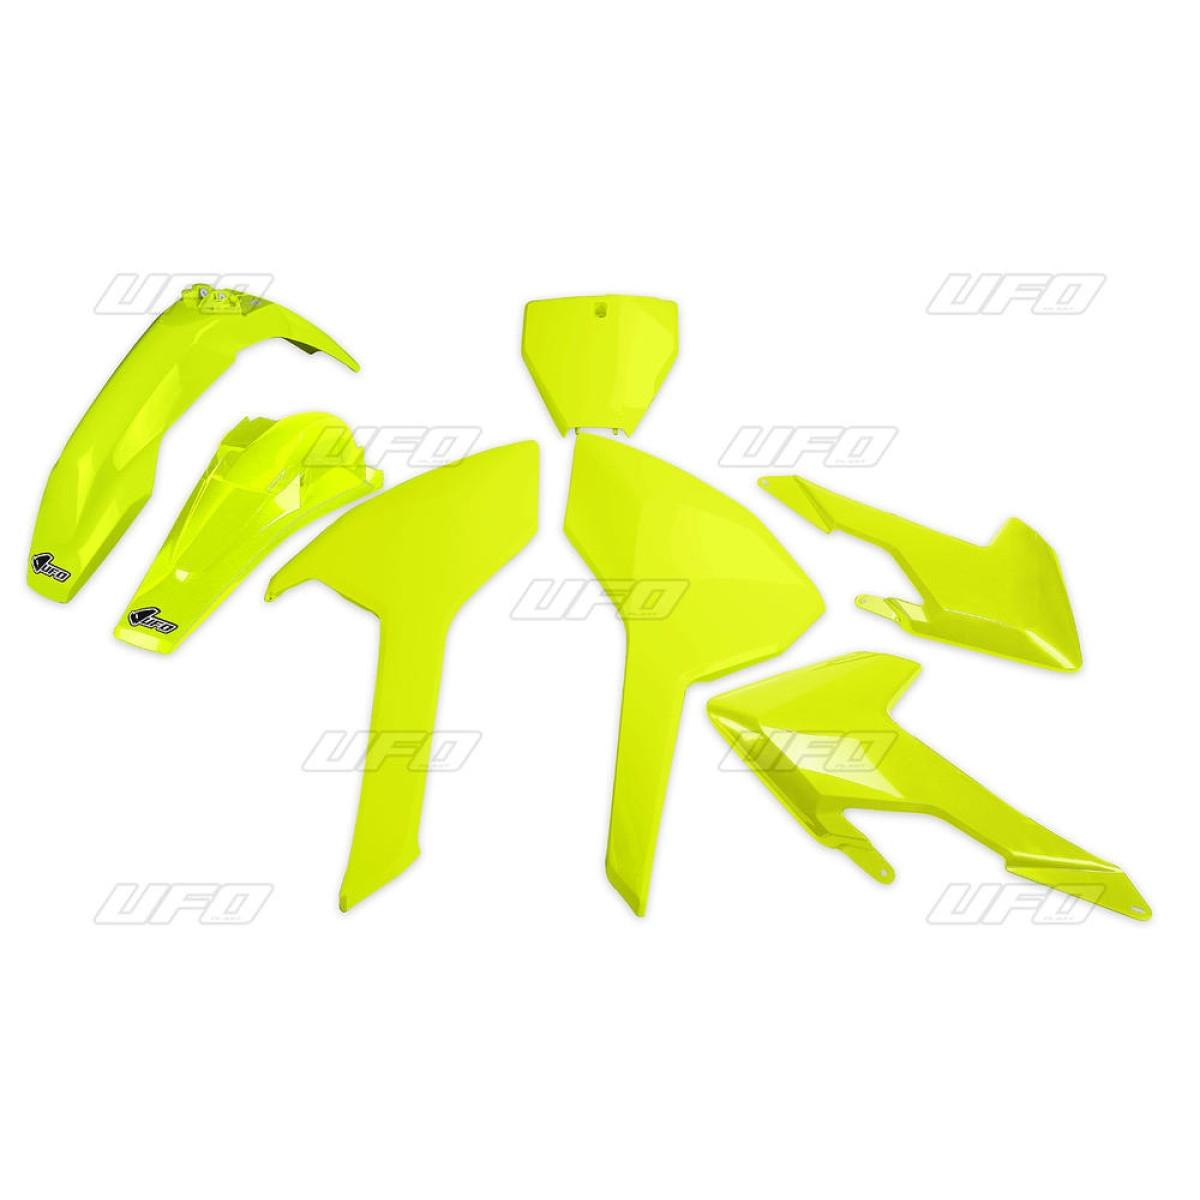 Kit plastique UFO Husqvarna 125 TC 16-18 jaune fluo